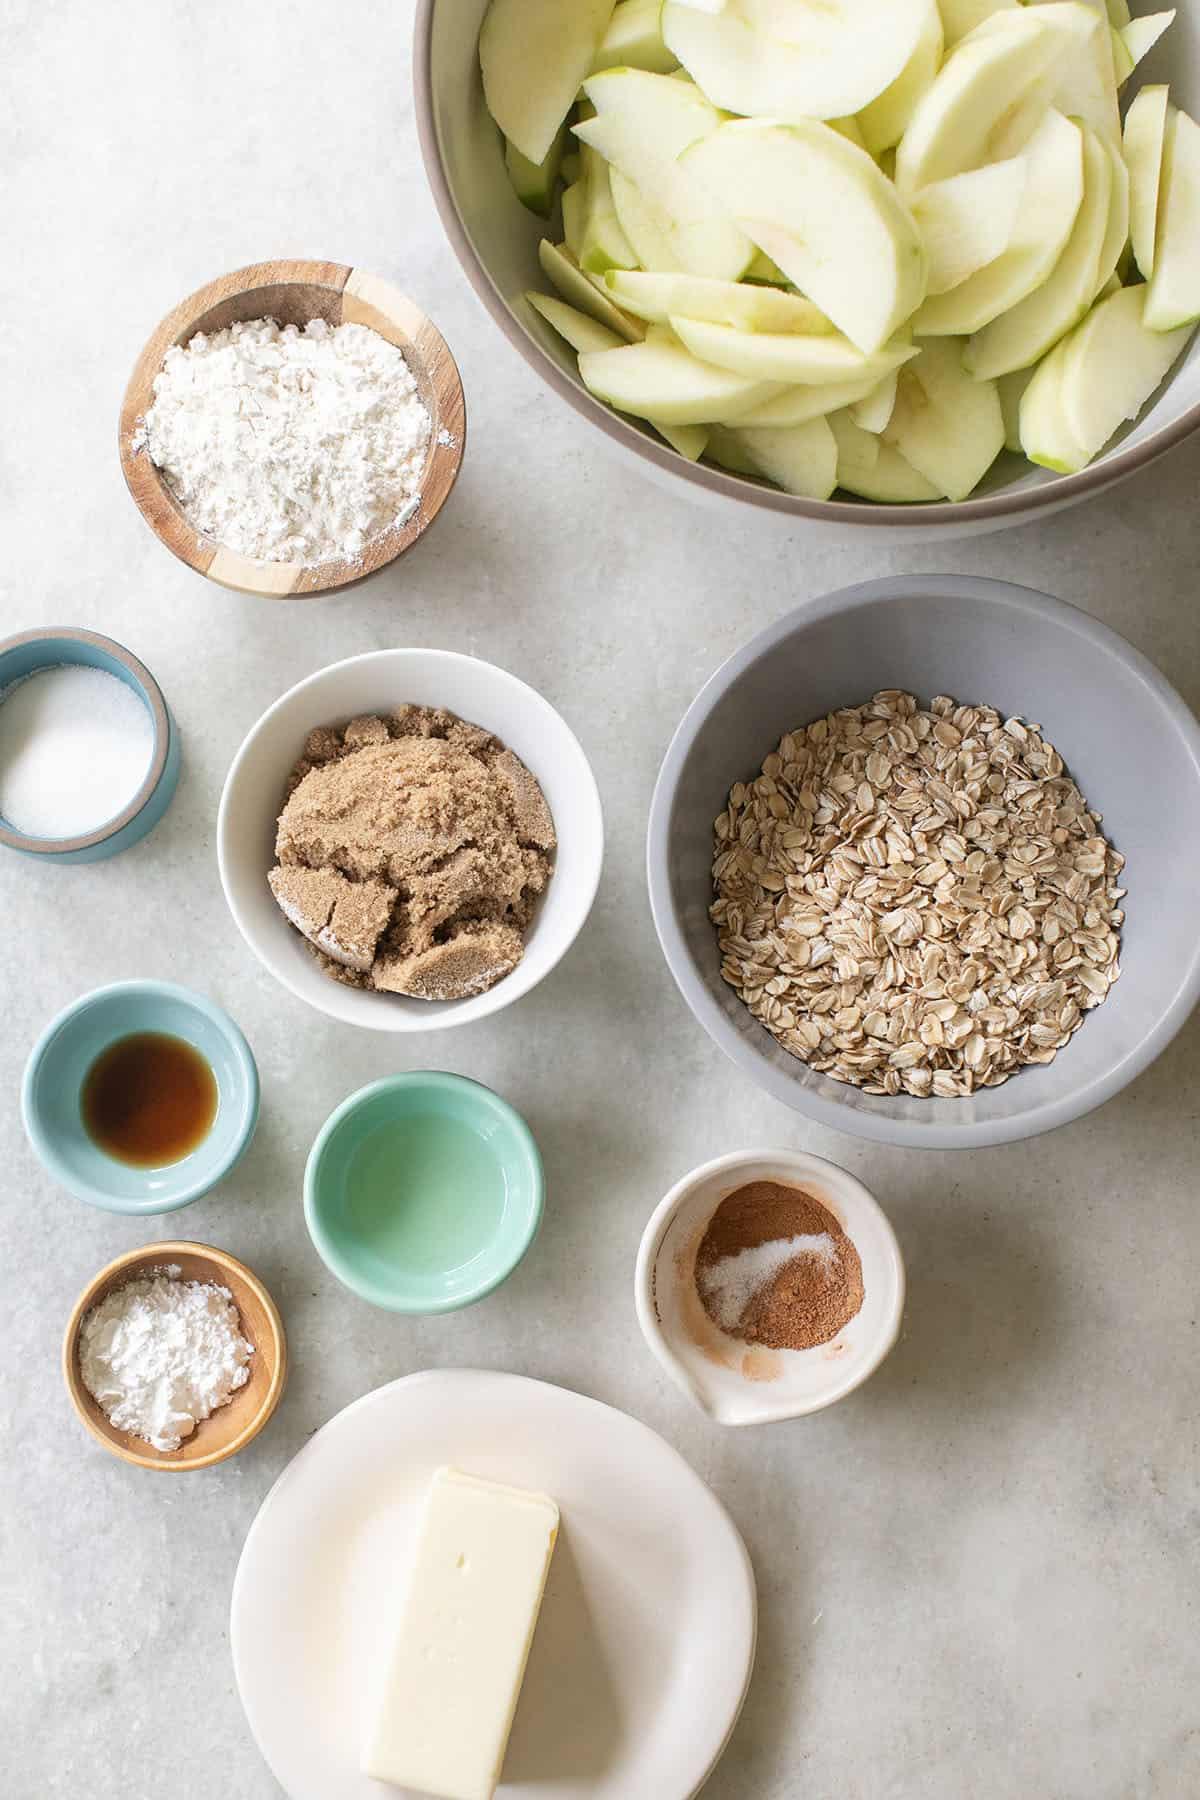 apple crisp ingredients